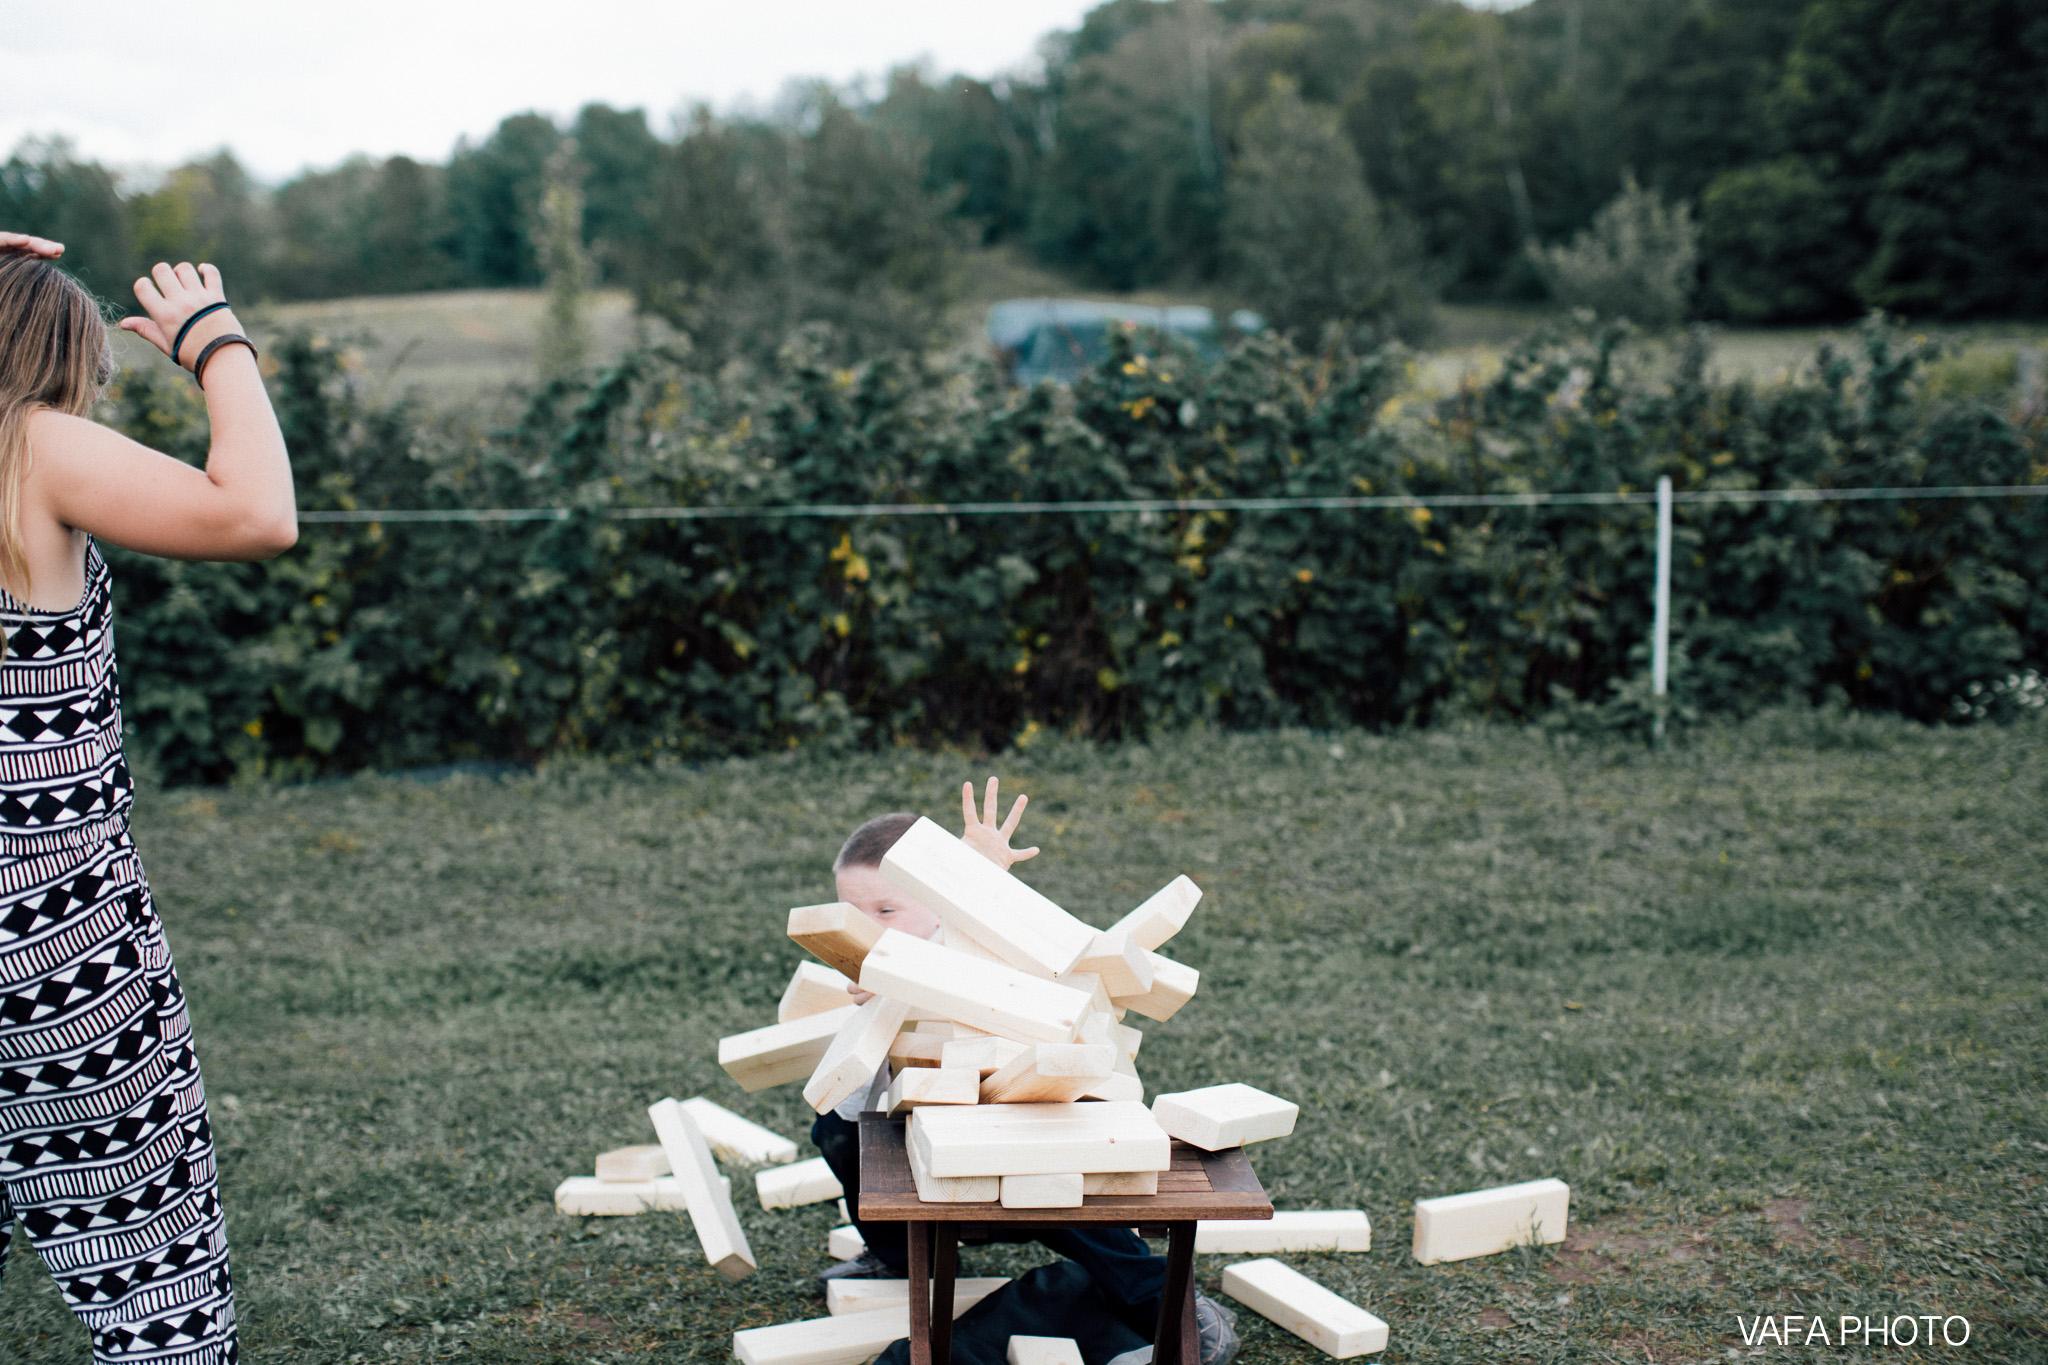 Belsolda-Farm-Wedding-Christy-Eric-Vafa-Photo-545.jpg